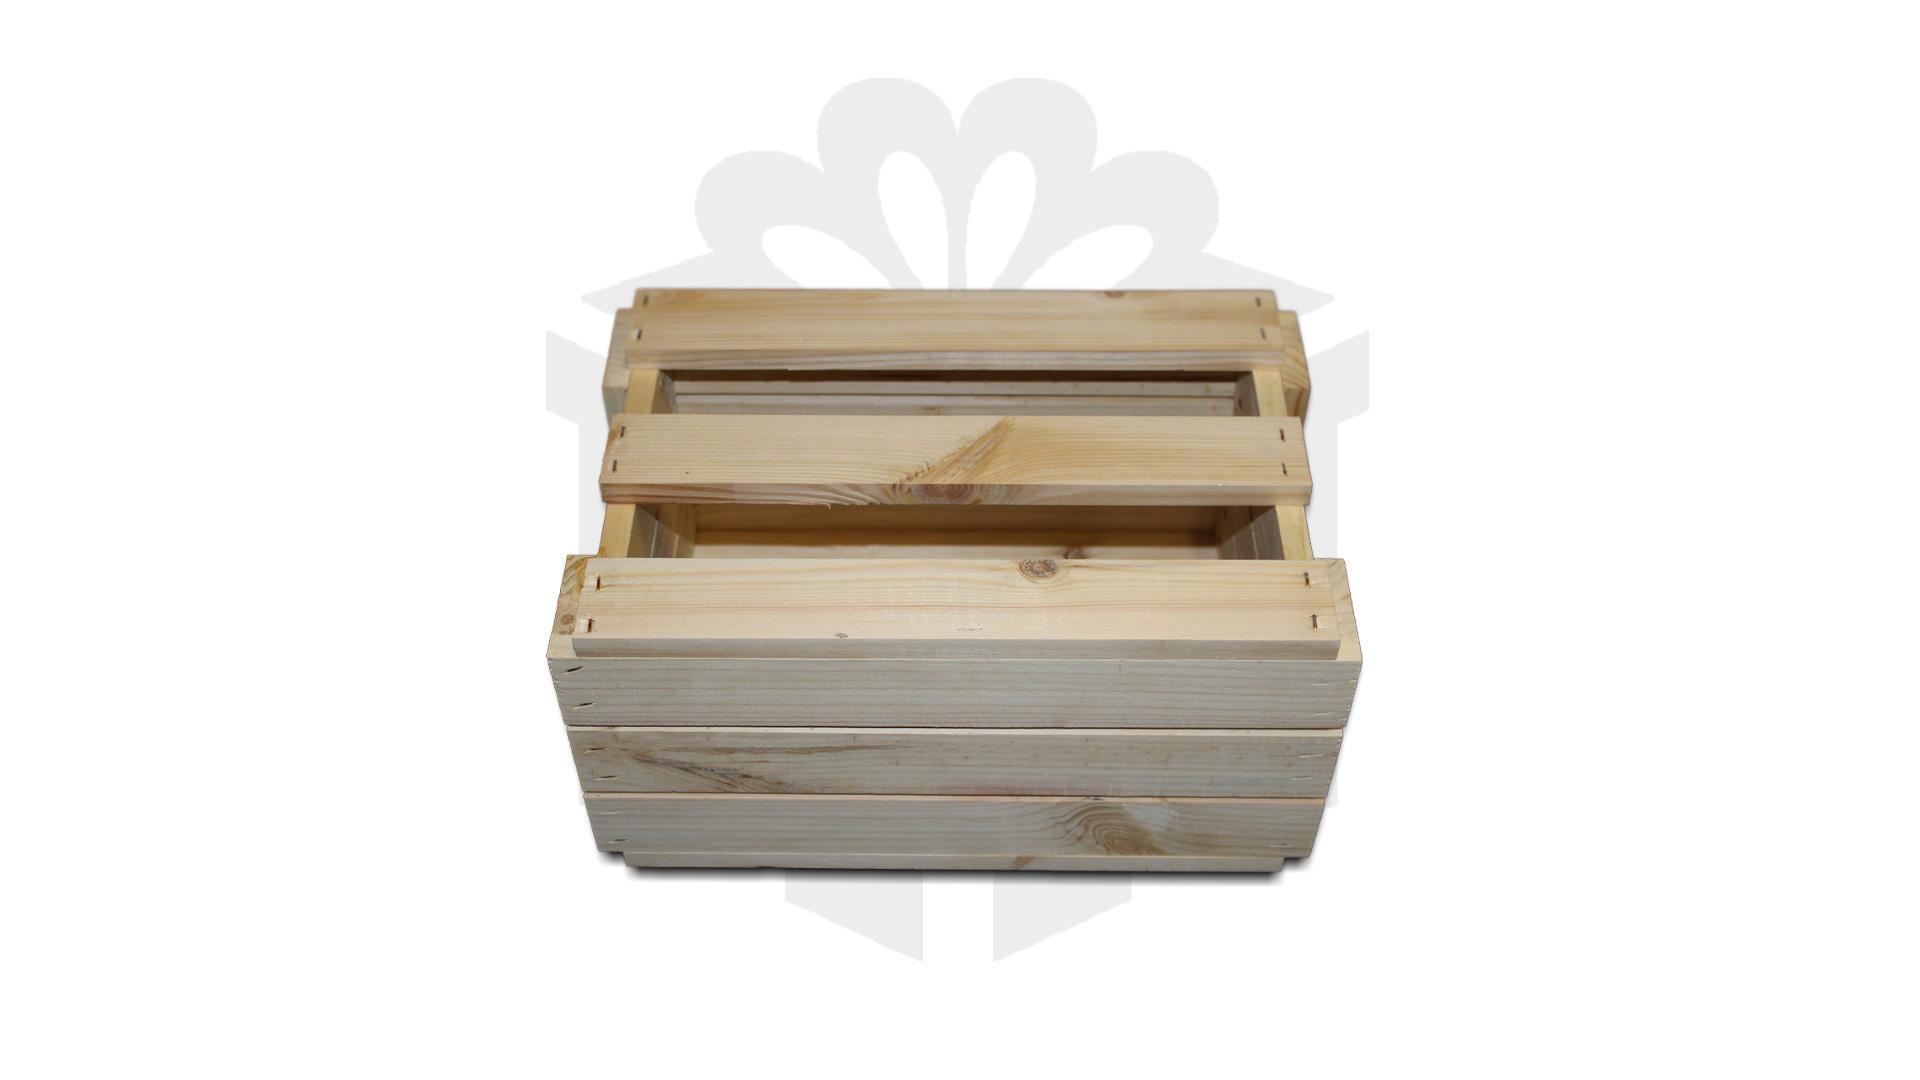 Ящик деревянный Тип 5-1